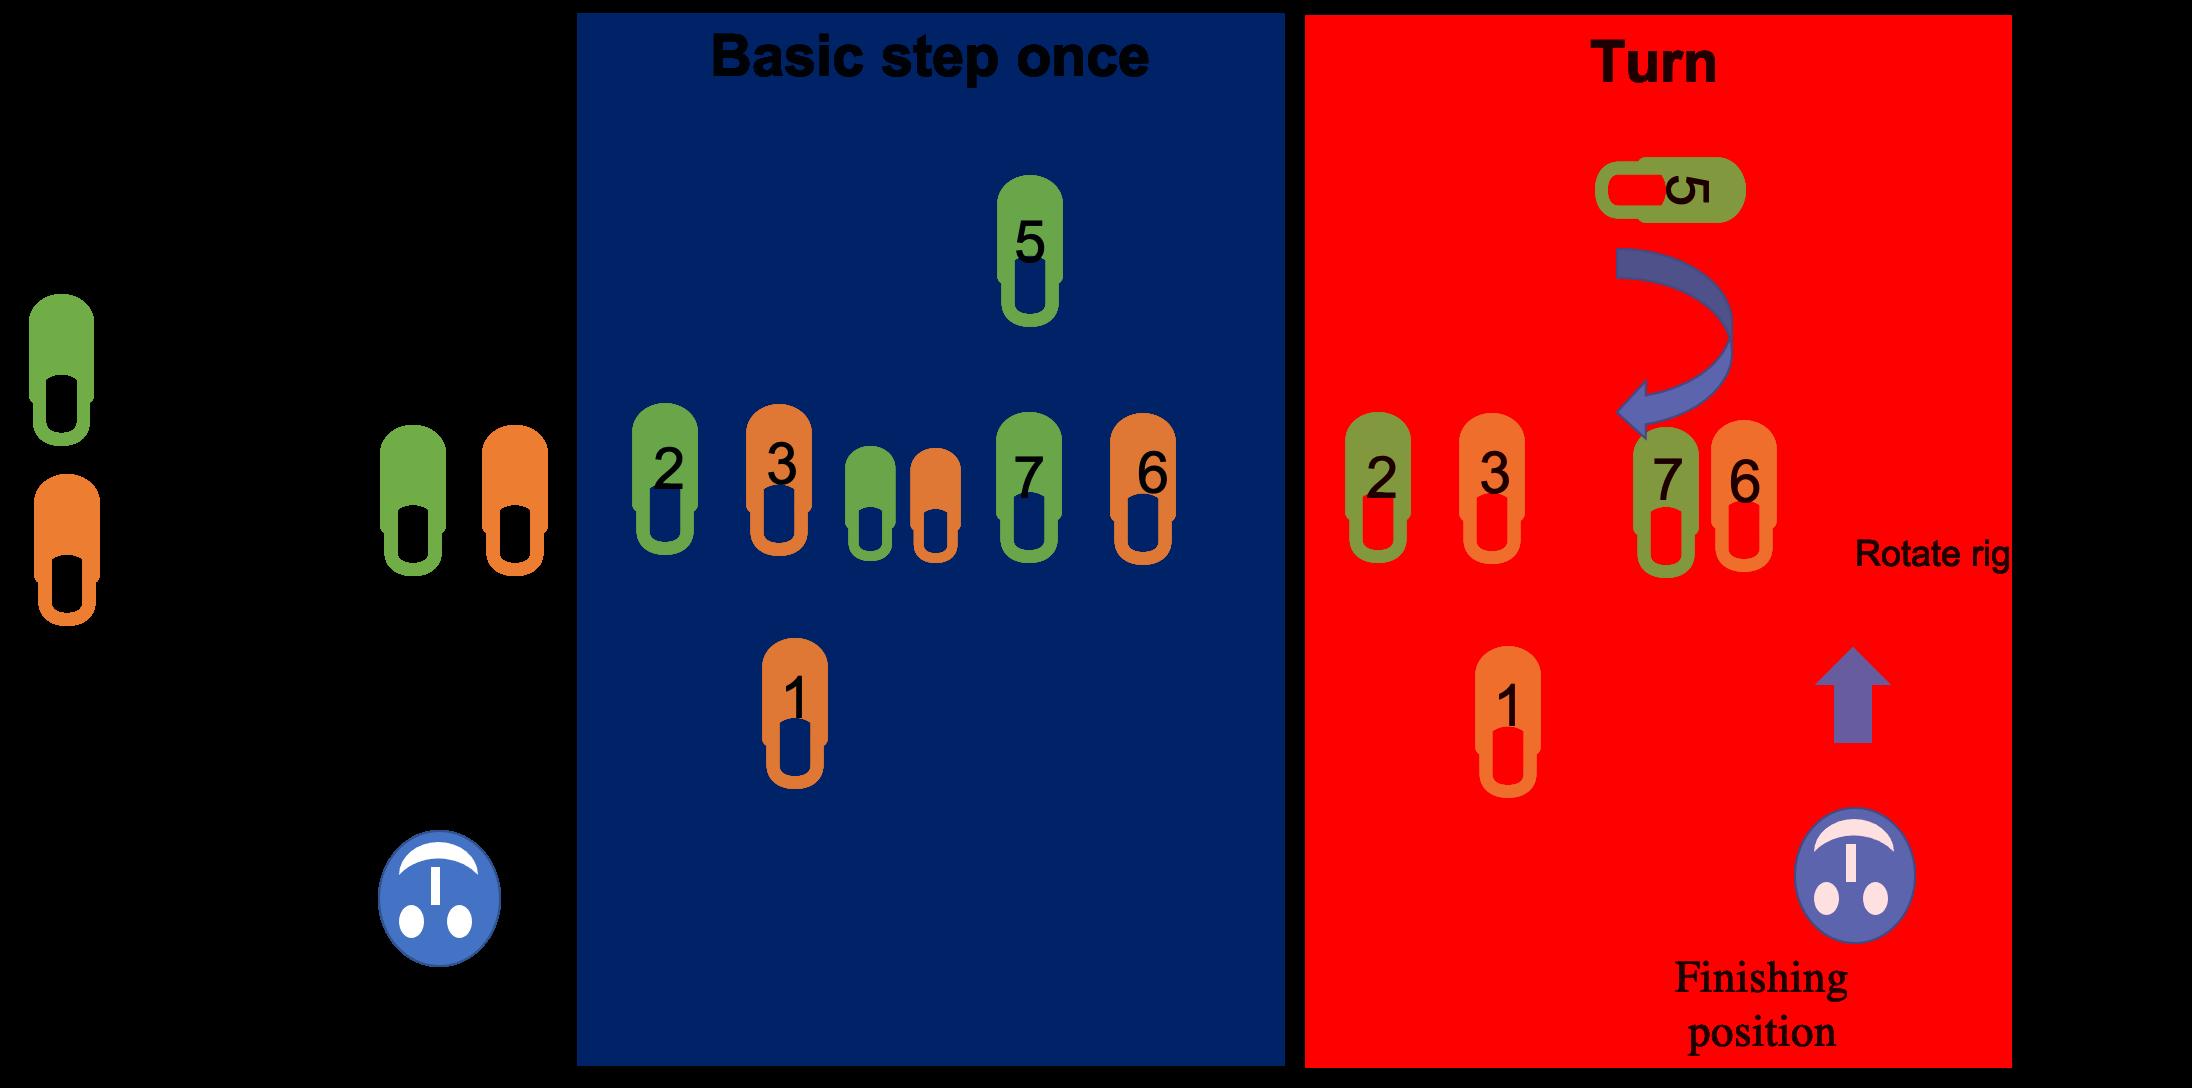 basic salsa dance steps with turn for women